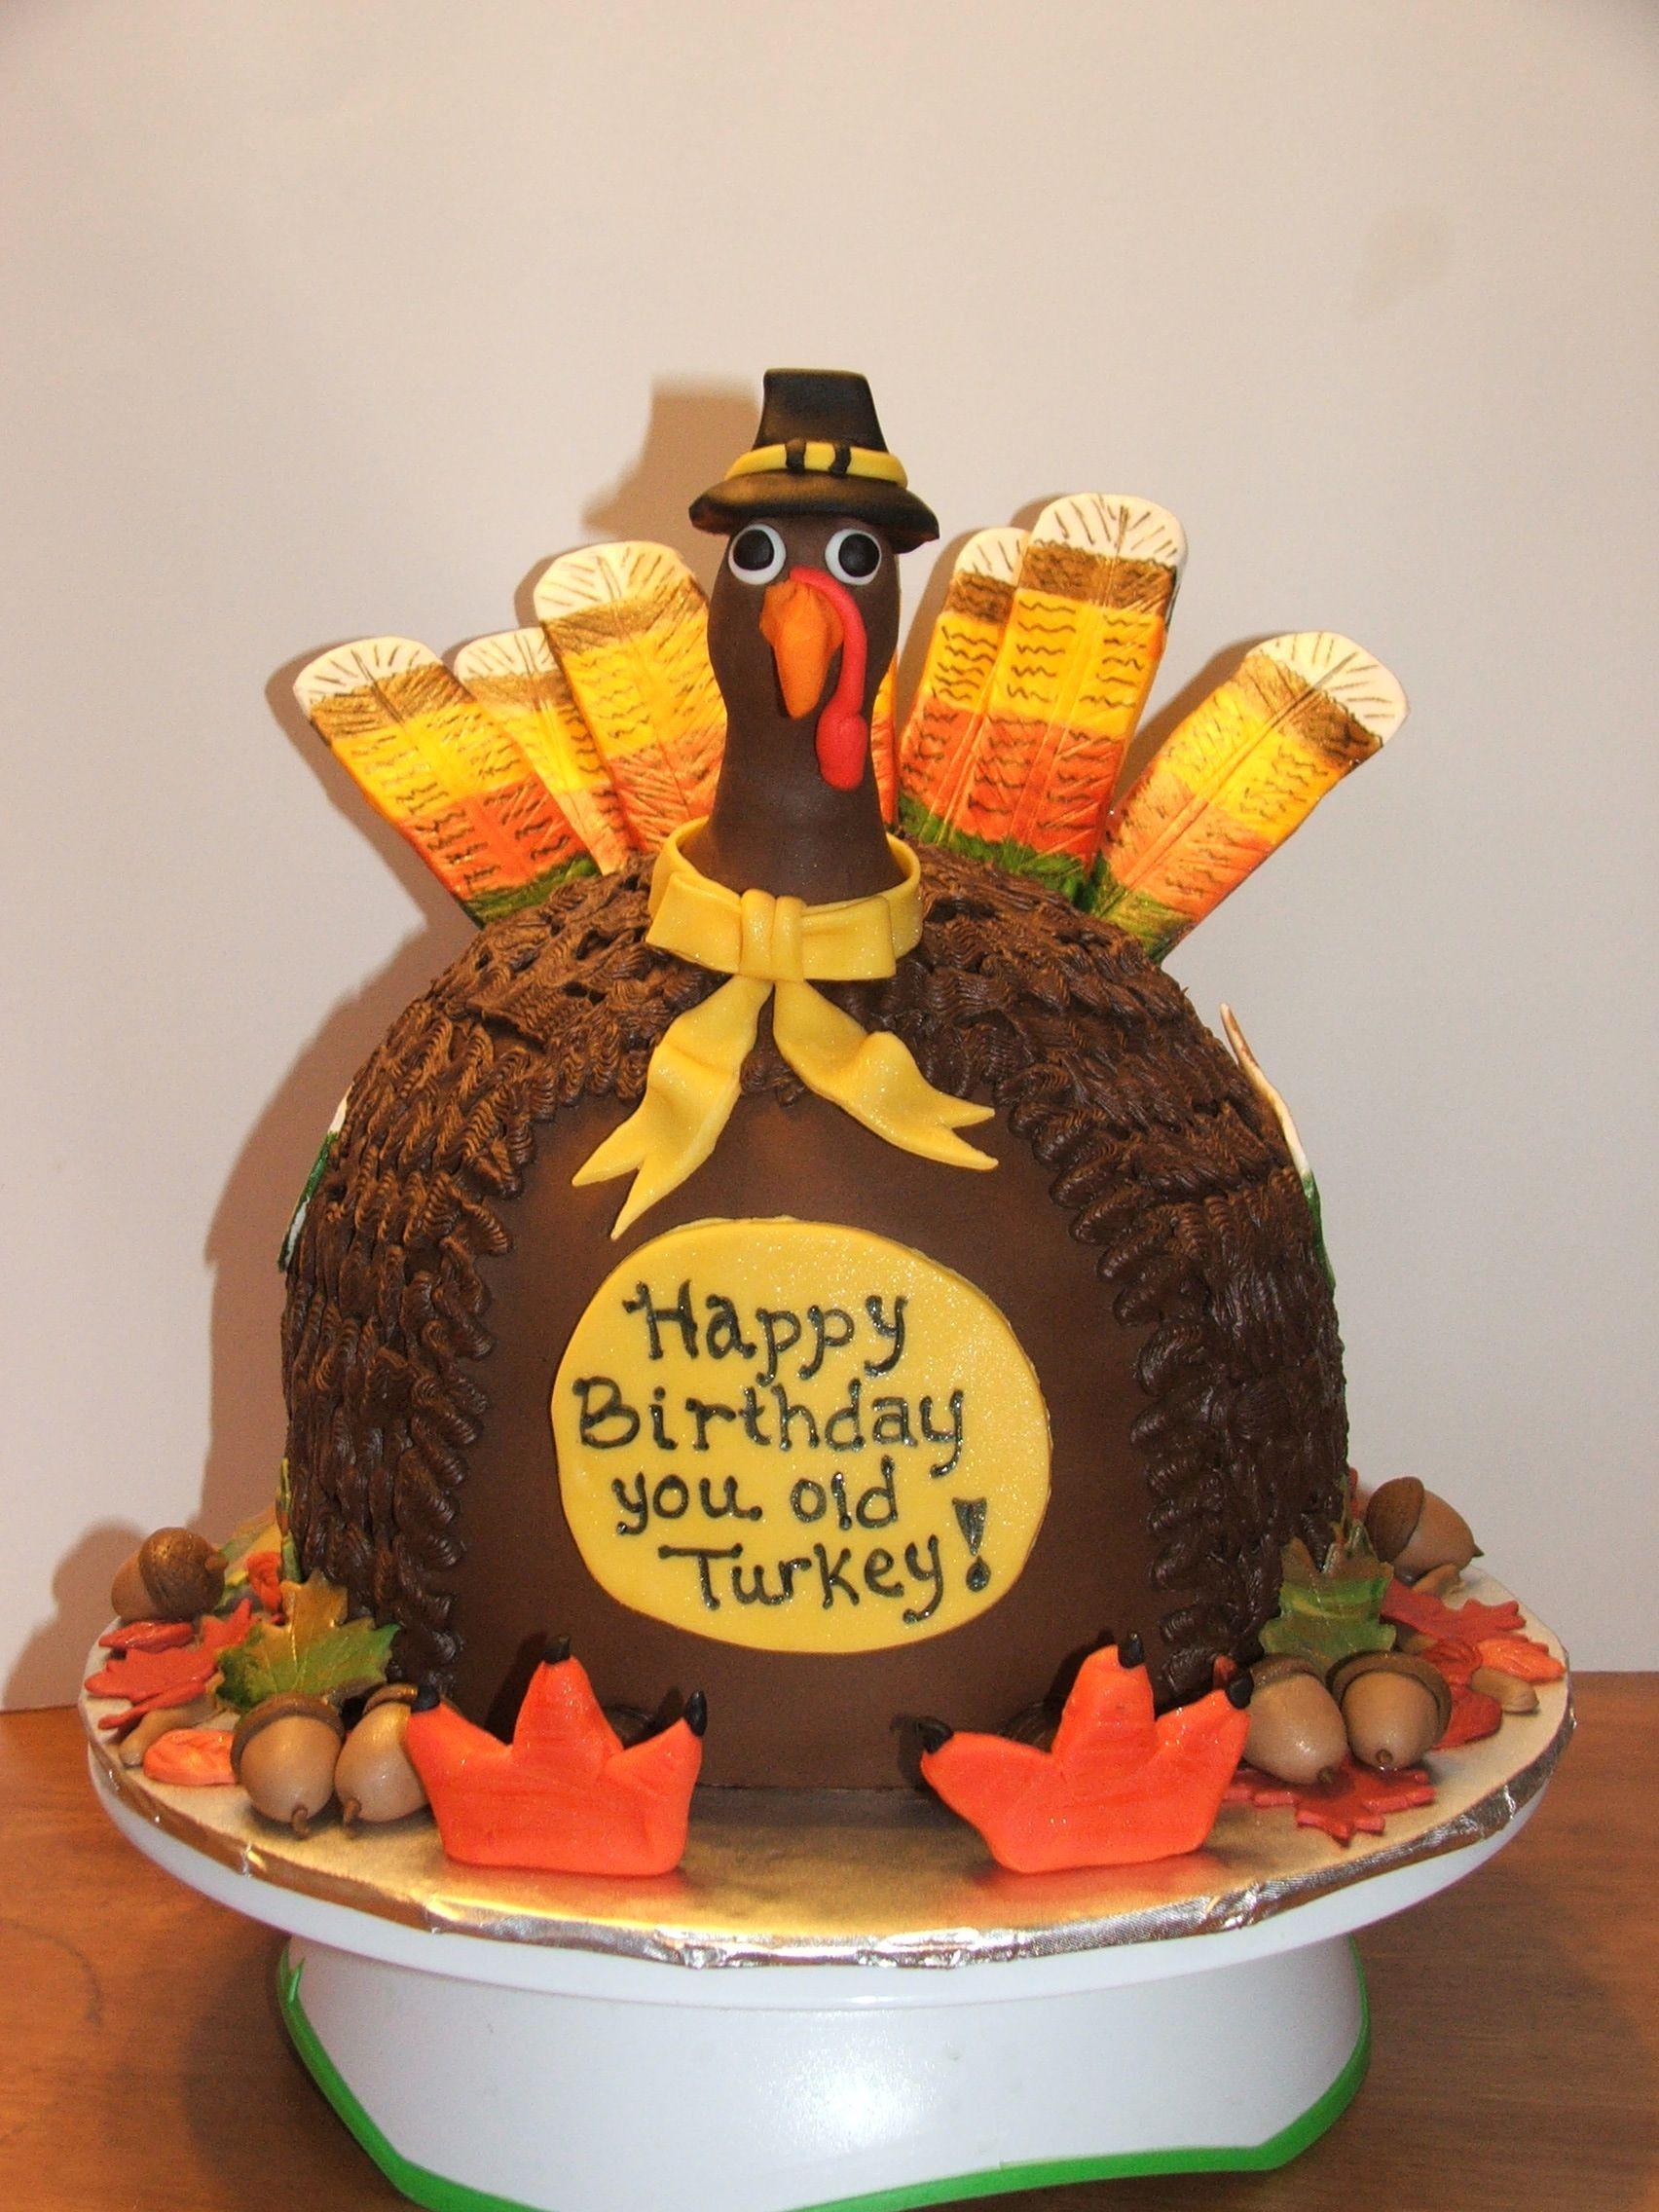 Thanksgiving Birthday Cake  did someone say TURKEY it is a thanksgiving birthday cake